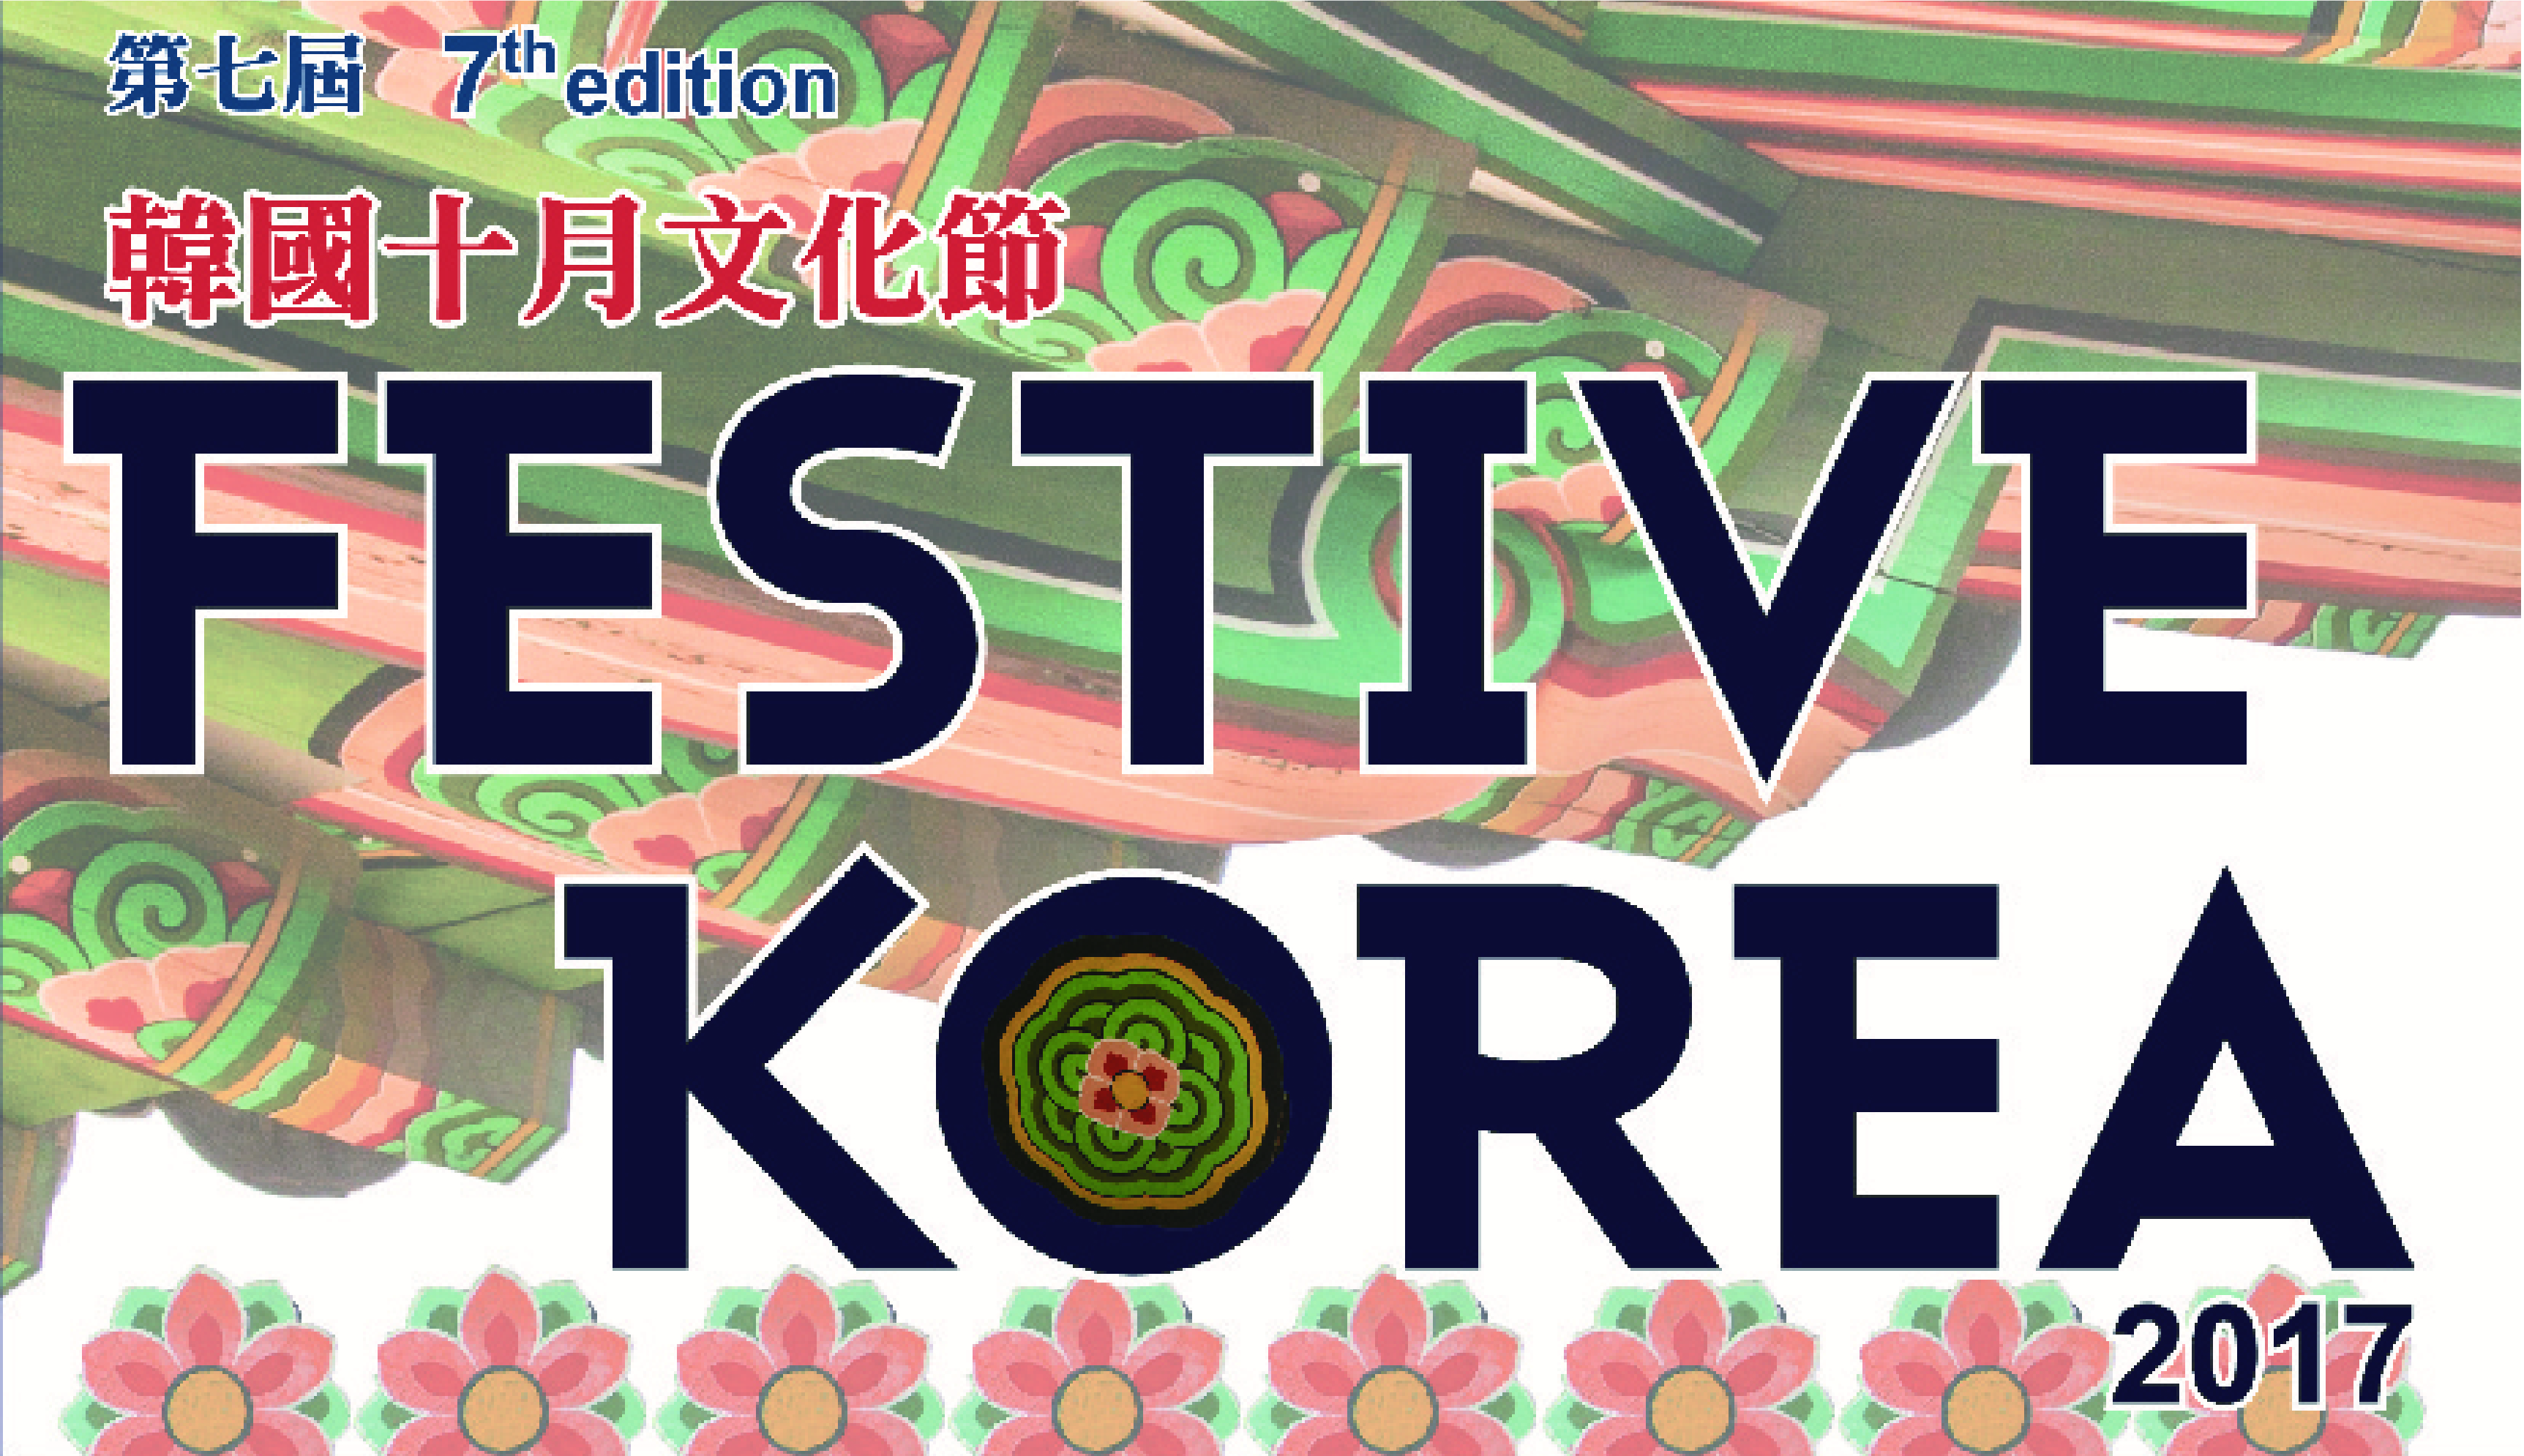 Festive Korea Leaflet Cover-01